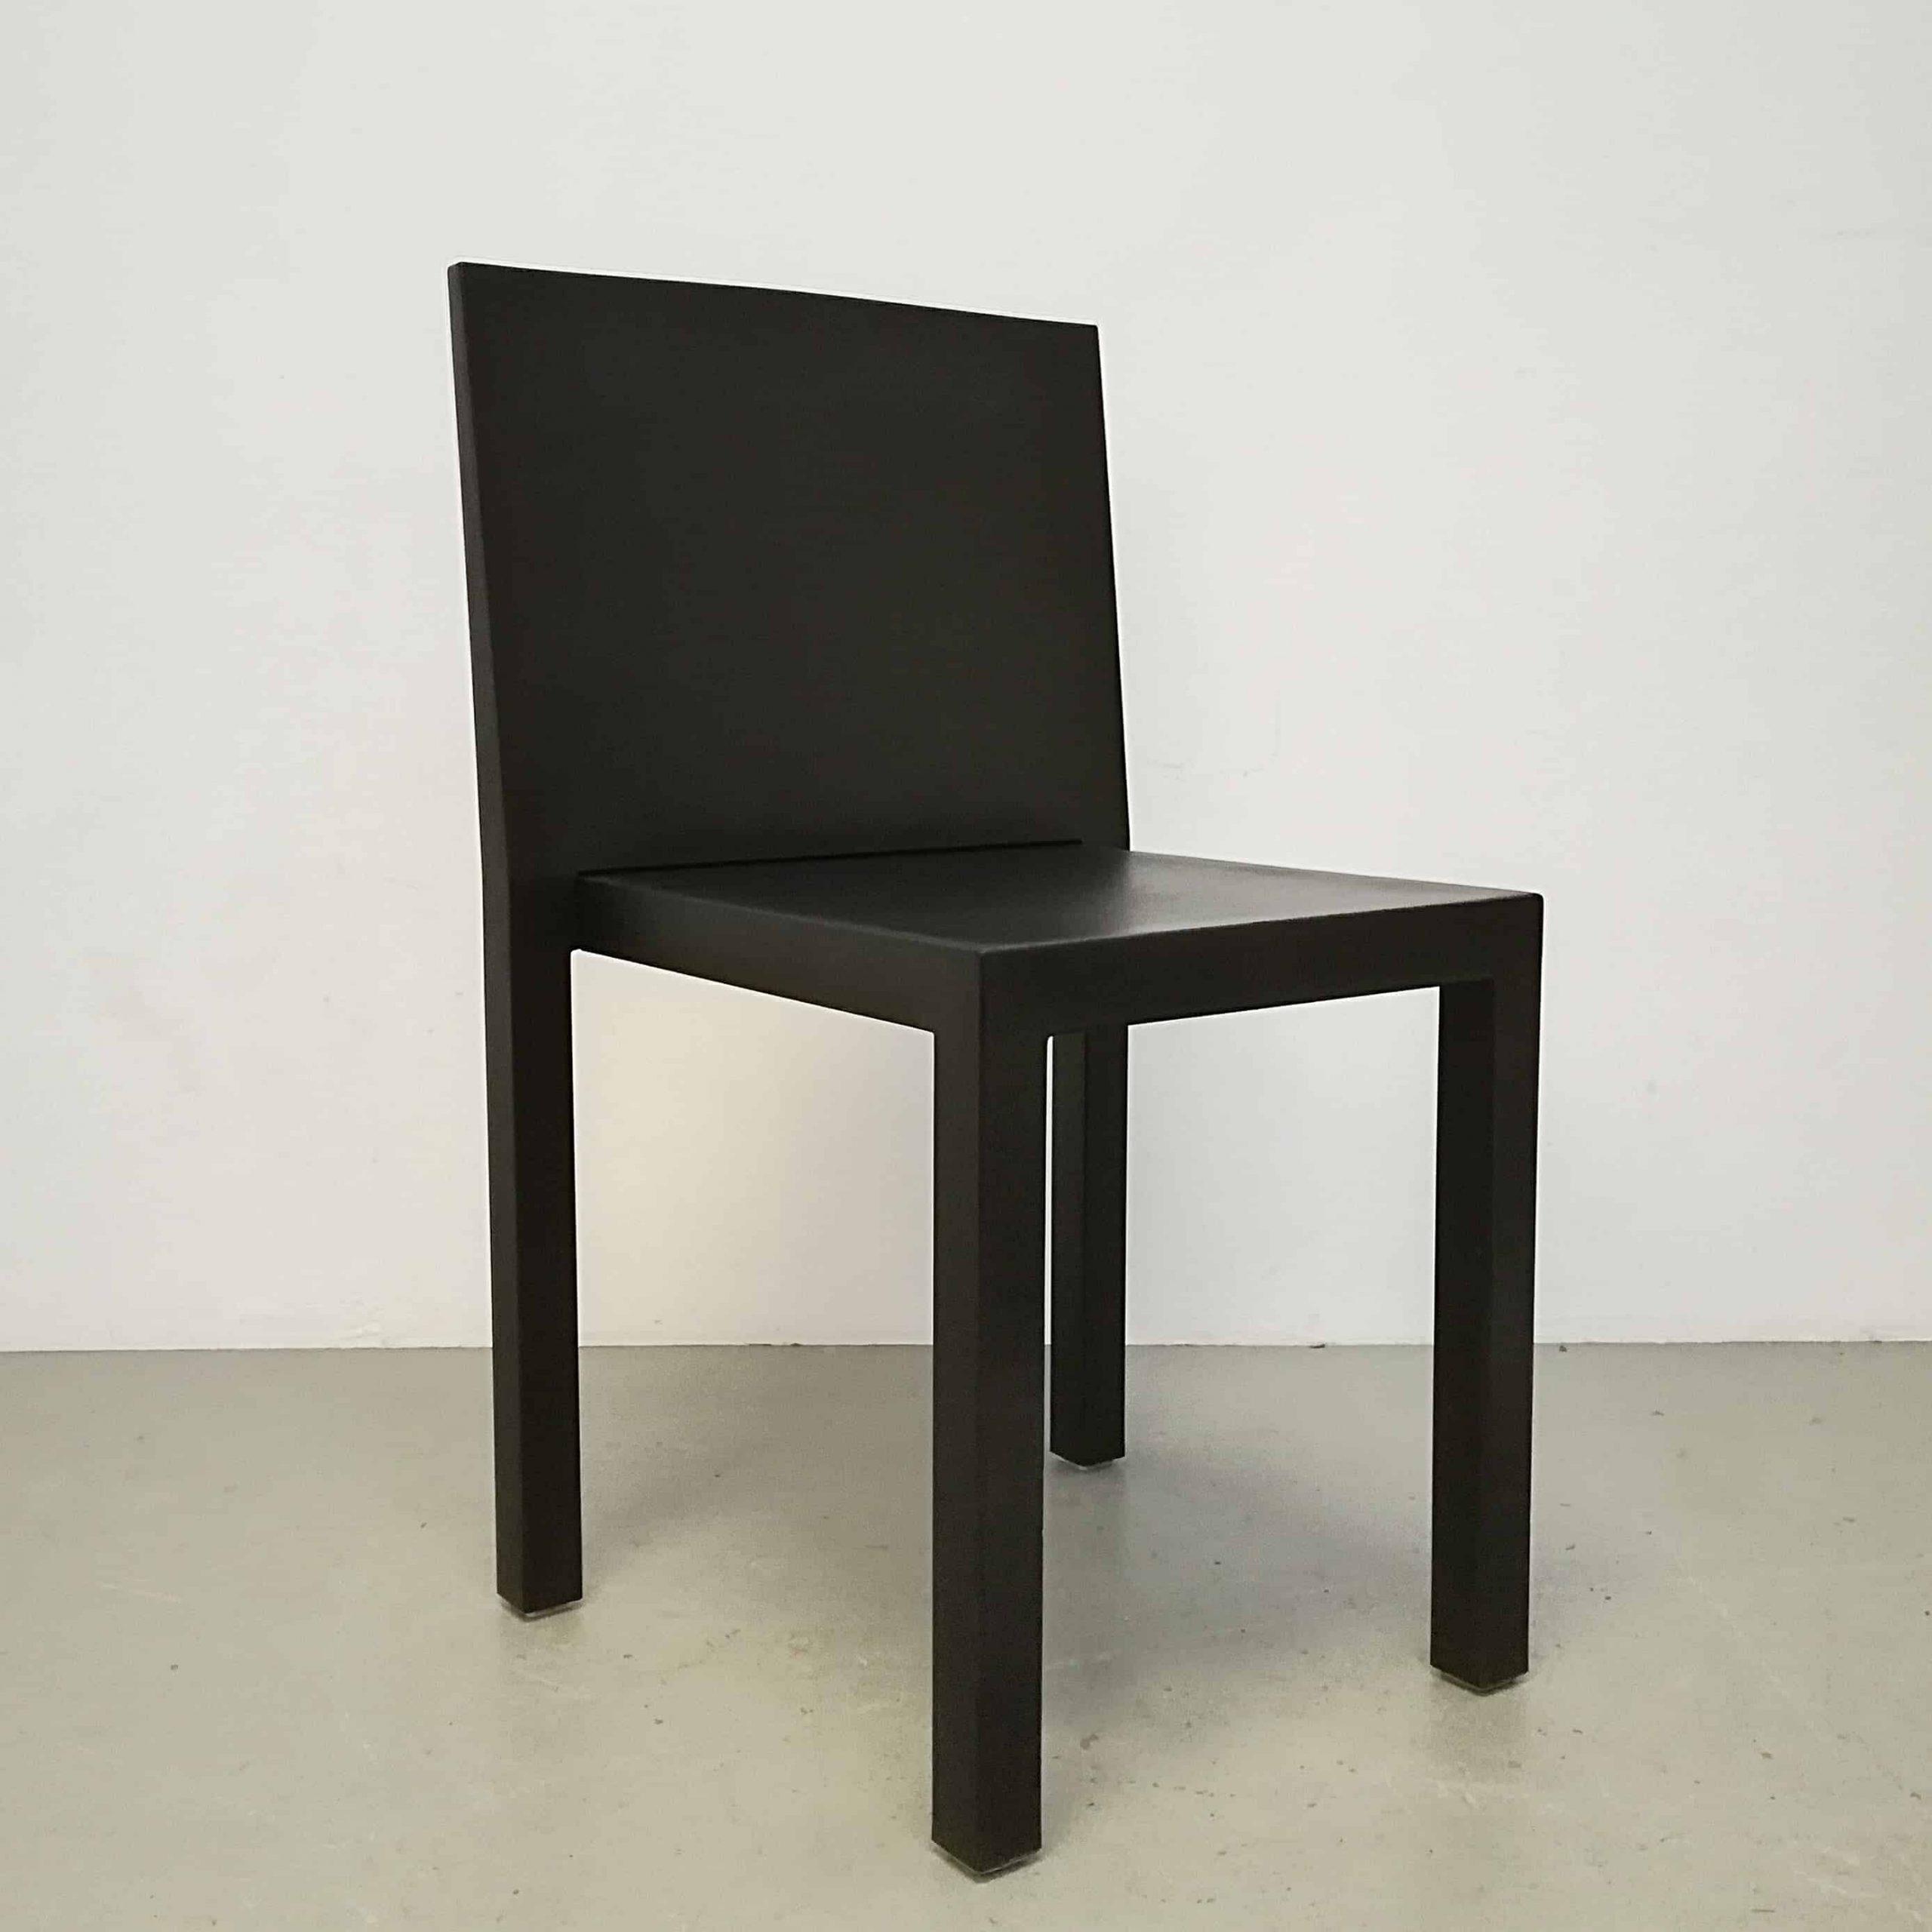 chair-black-uno-r606-segis-bartoli-design-steel-frame-elastic-technopolymer-stackable